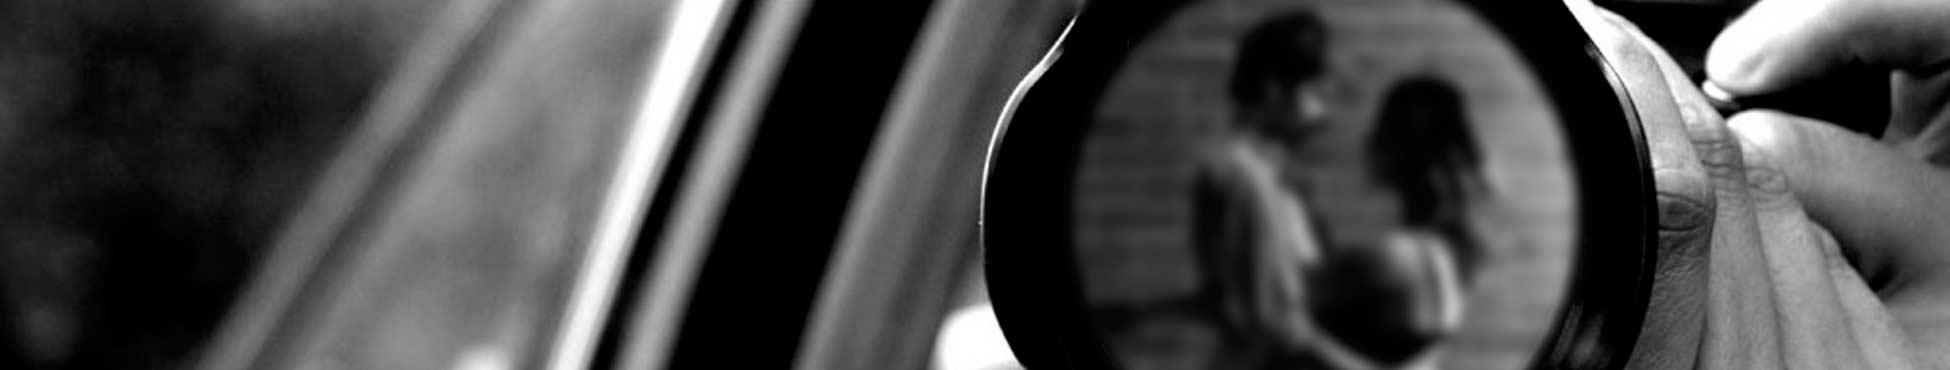 Elche Detectives. Agencia detectives Privados